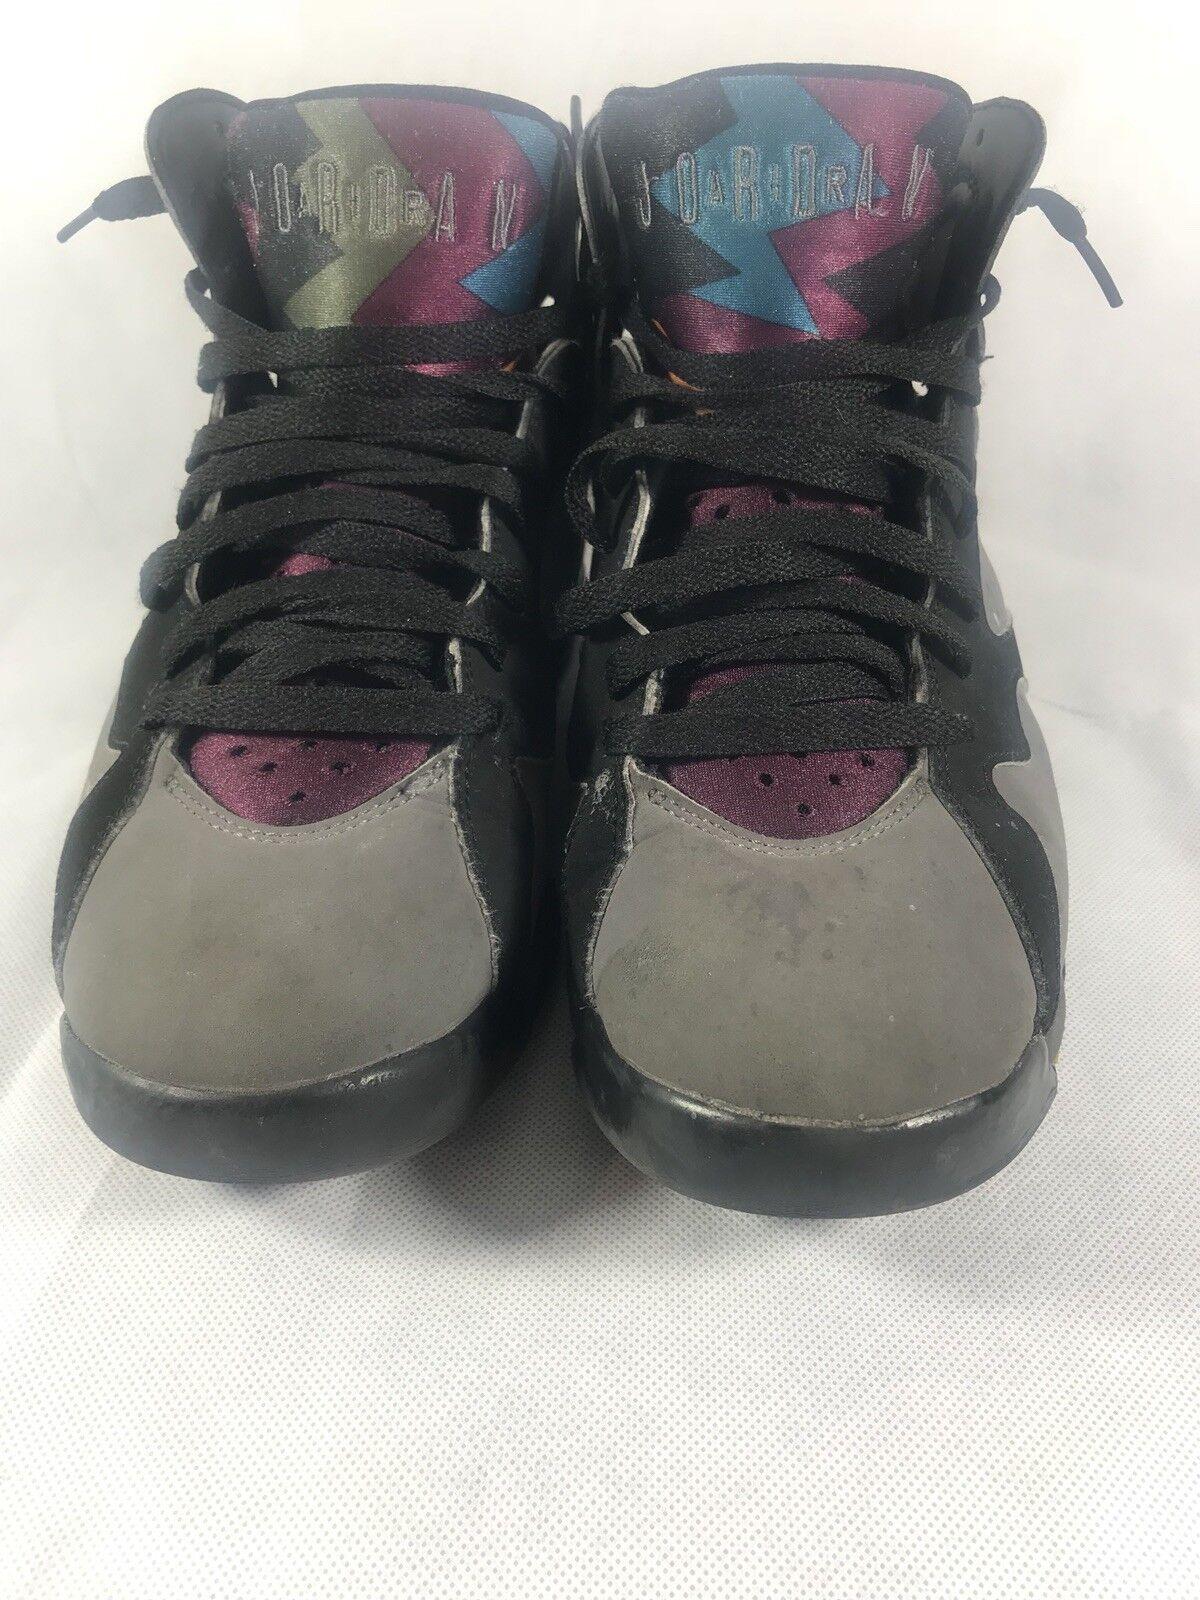 2015 Nike Air Jordan Retro 7 Bordeaux Size 8.5